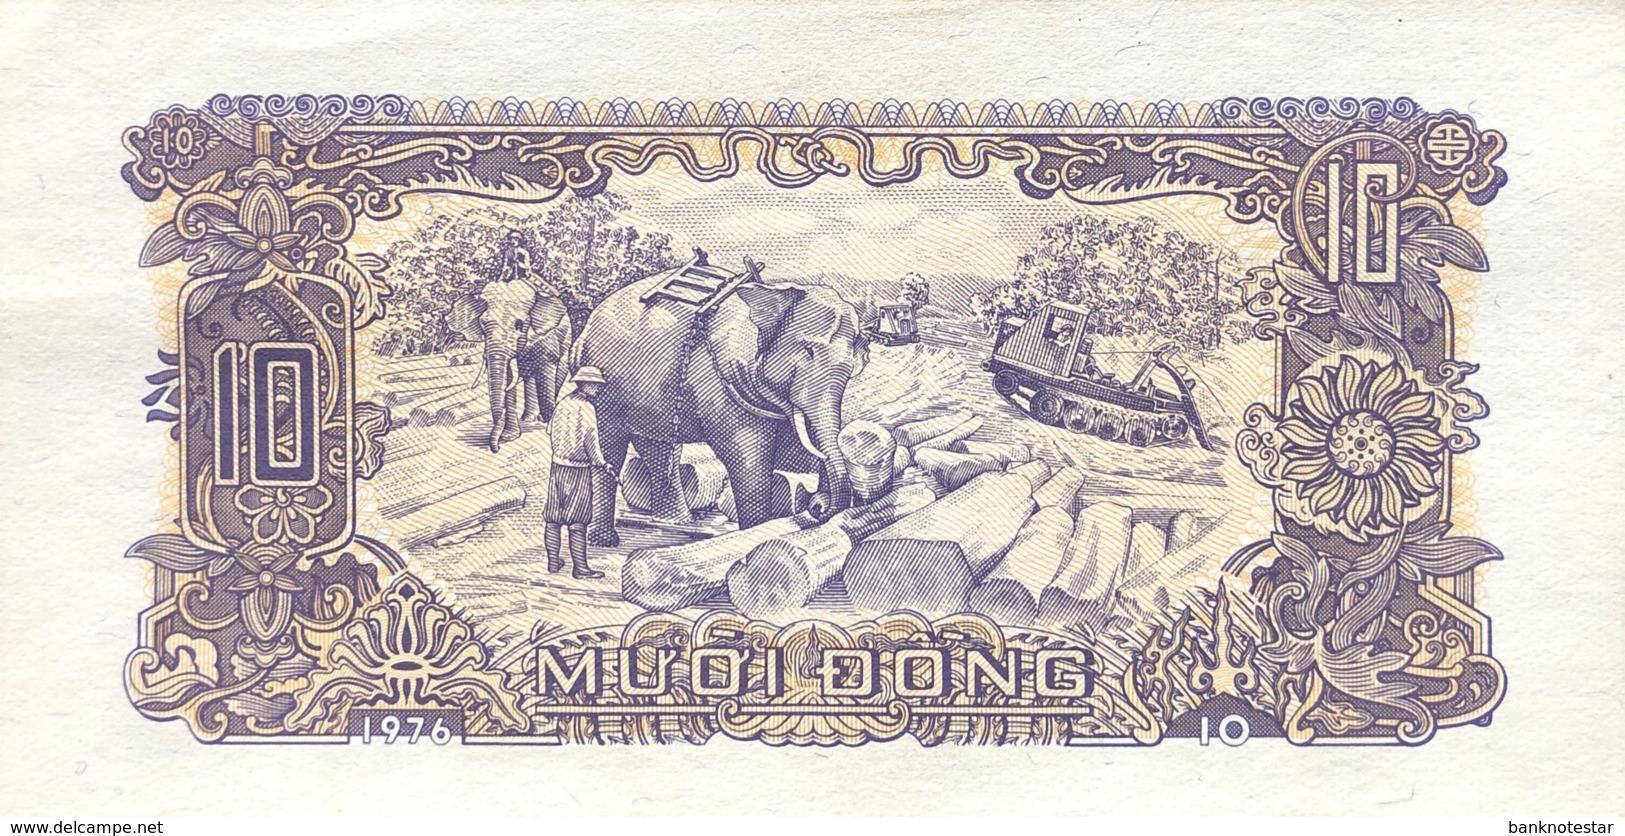 Vietnam 10 Dong, P-82 (1976) - UNC - Vietnam